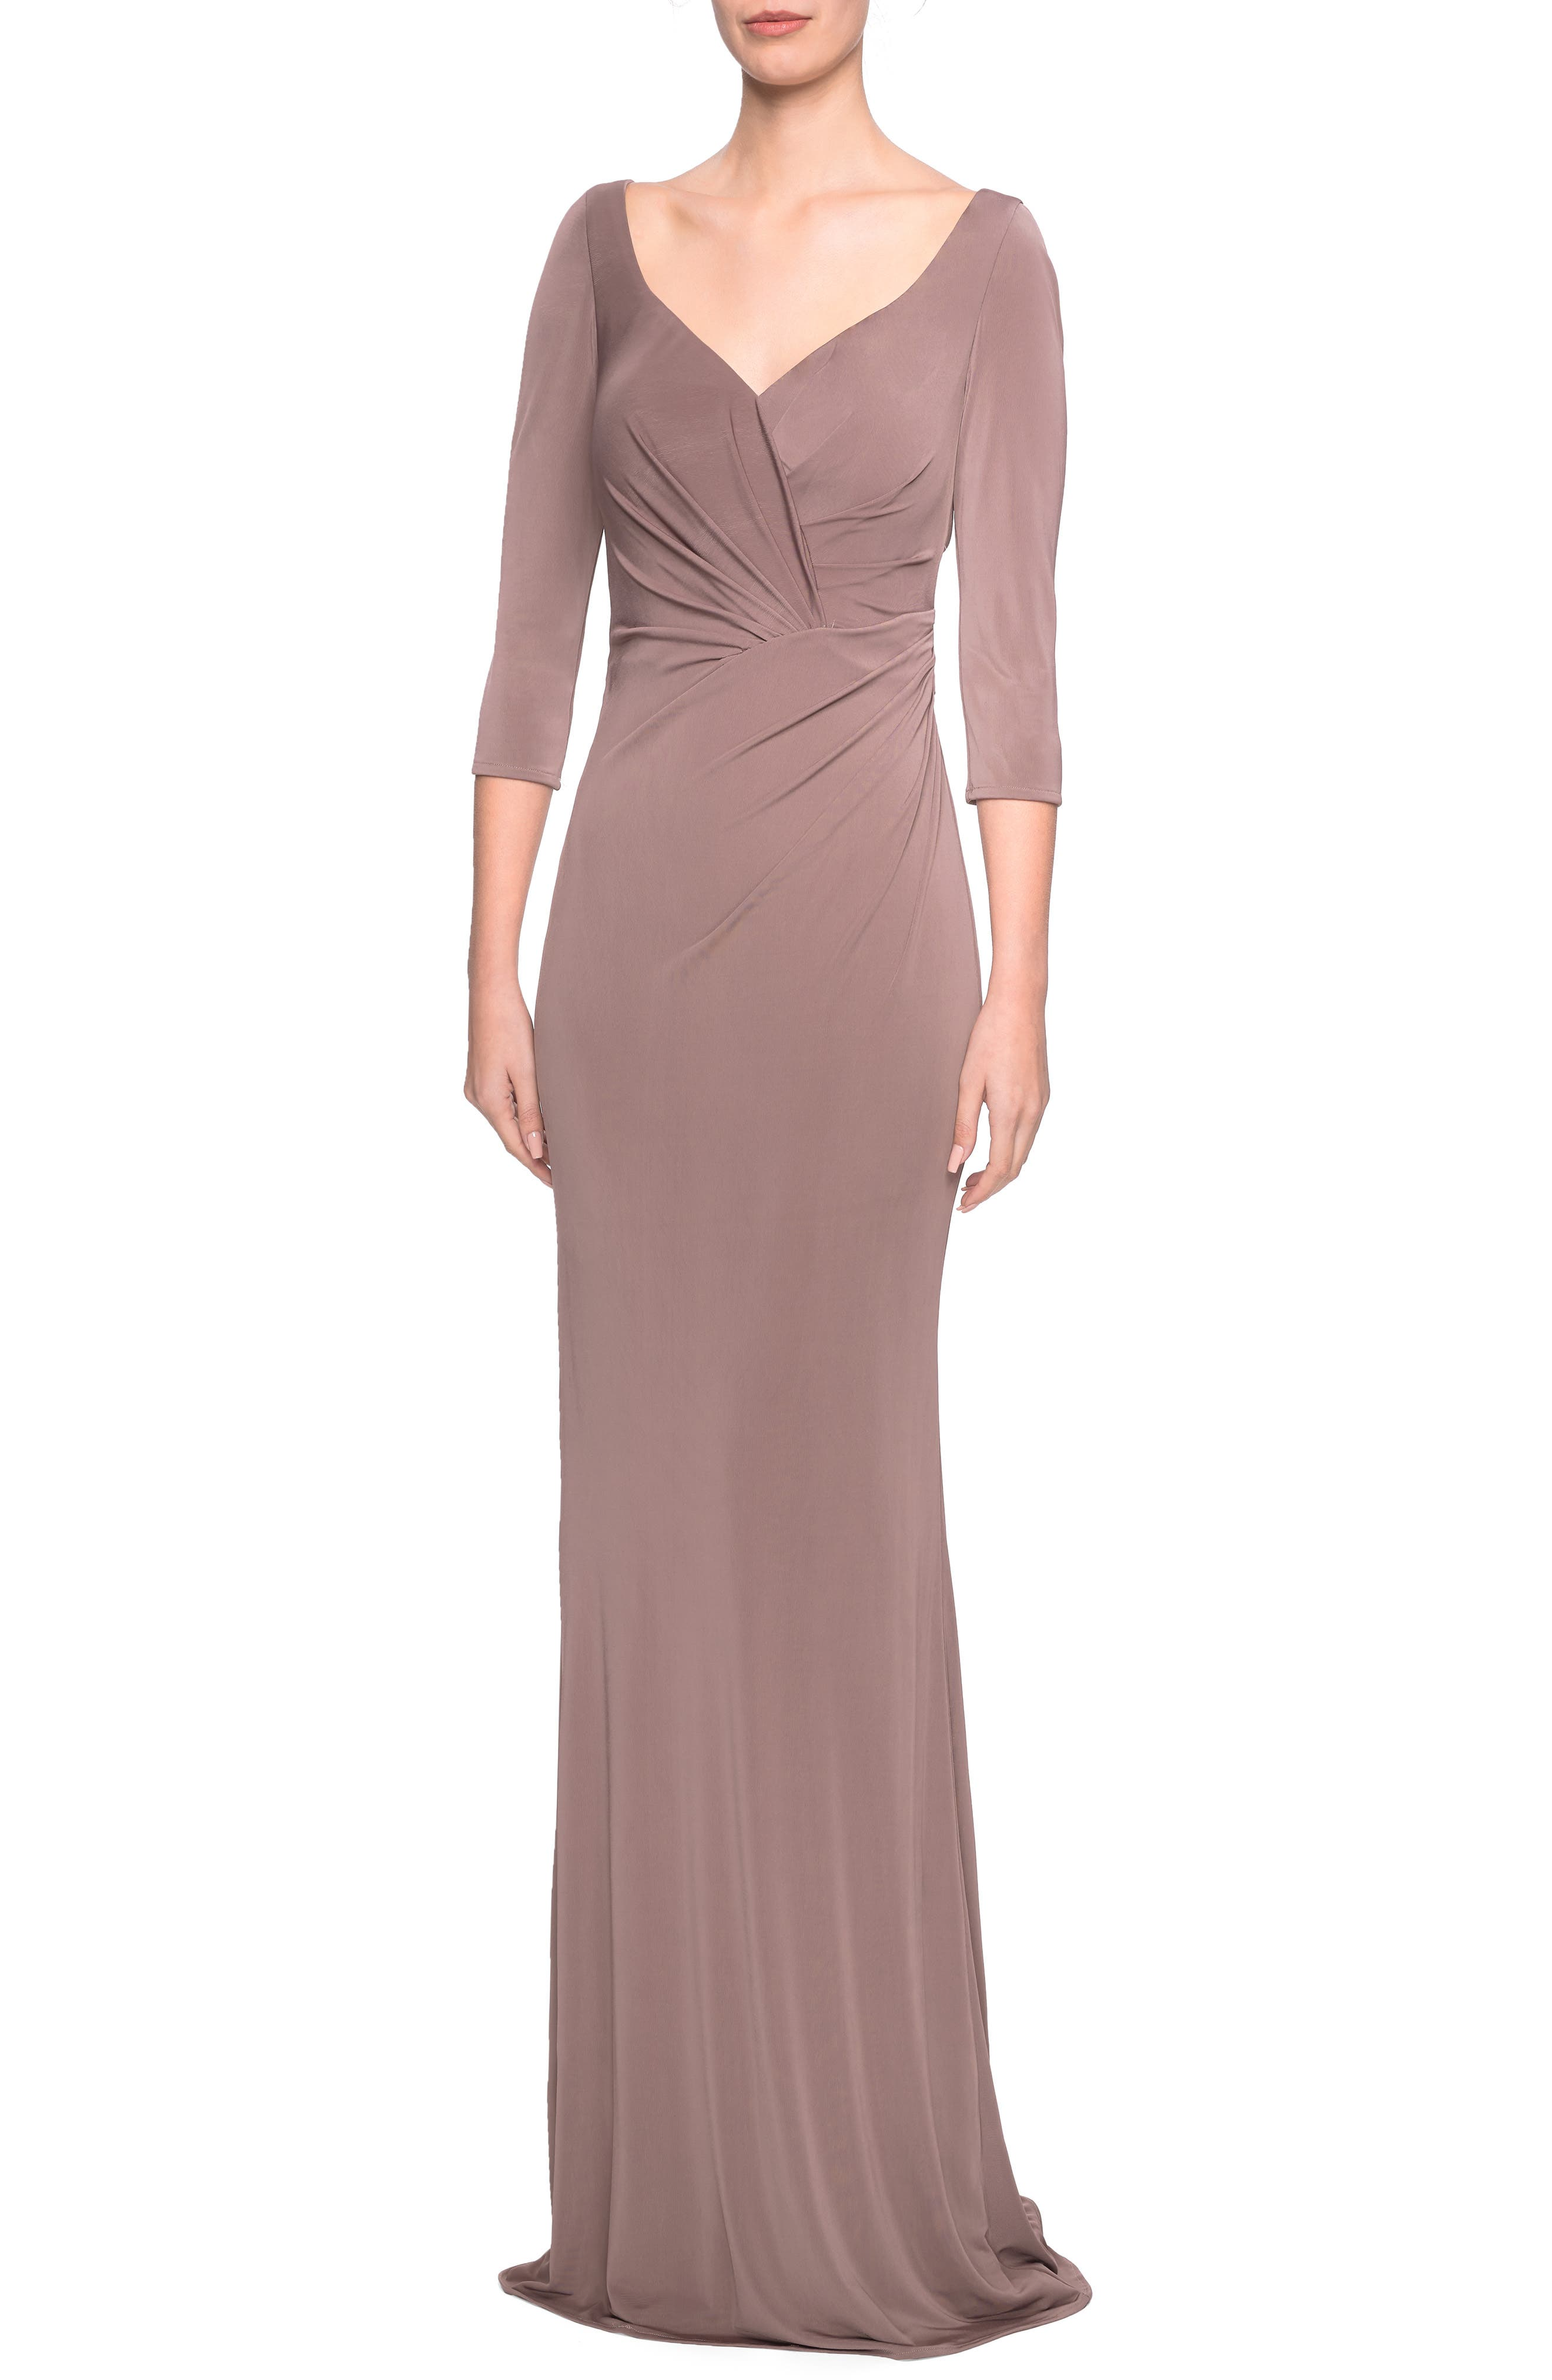 La Femme Ruched Jersey Evening Dress, Brown